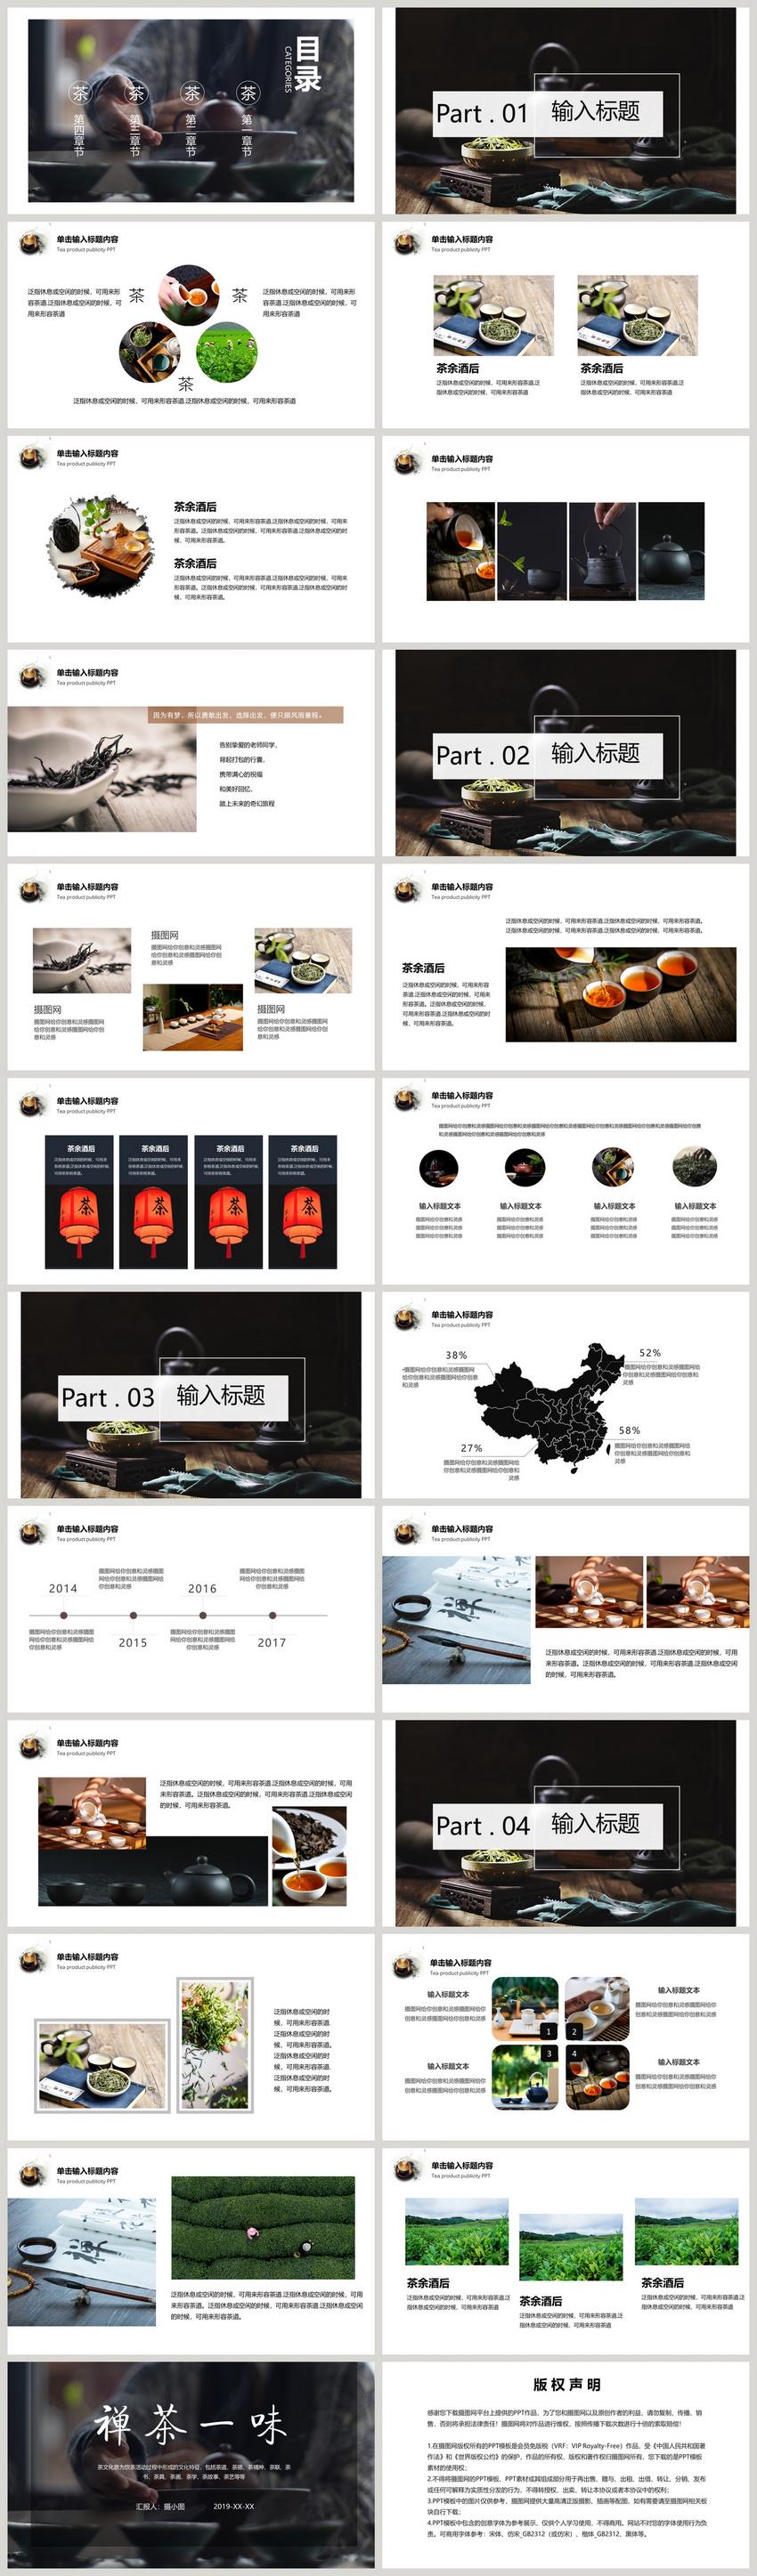 Zen Tea Yiwei Tea Culture Ppt Template Powerpoint Templete Ppt Free Download 401135571 Lovepik Com